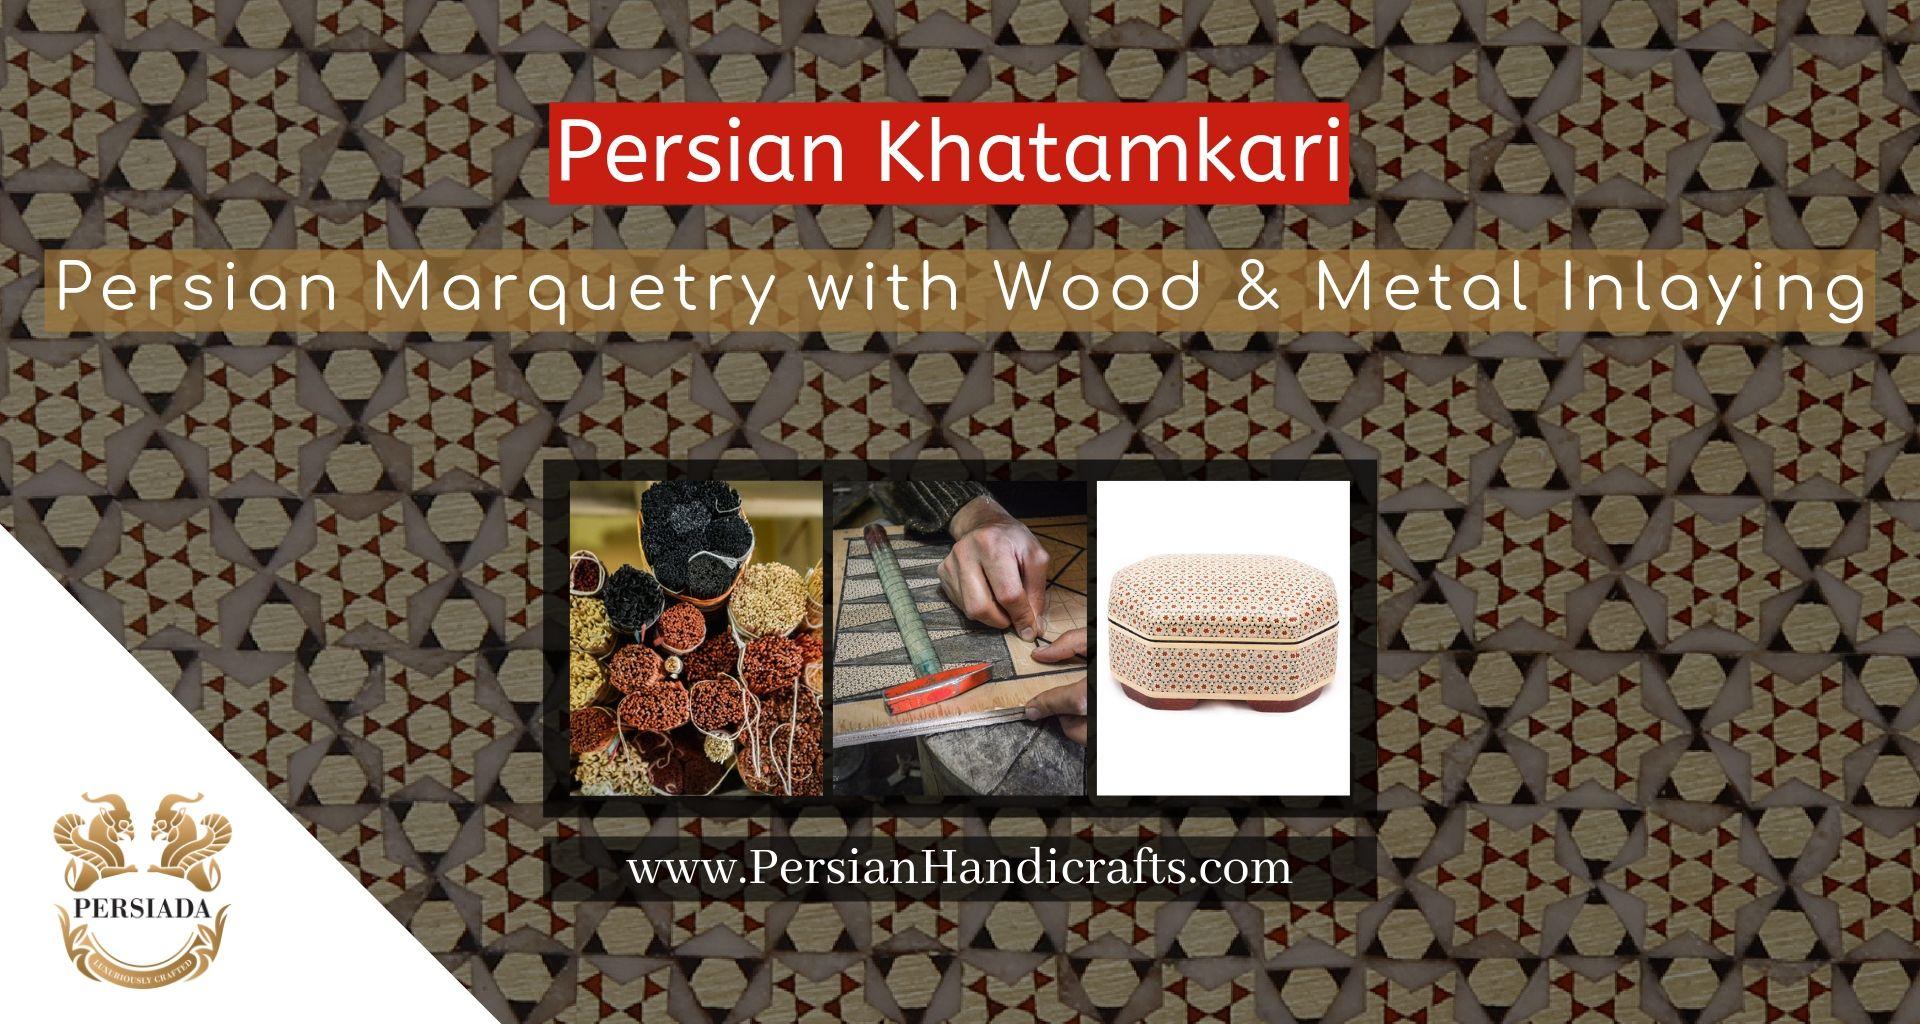 Persiada-Category-Khatamkari-Banner-V1